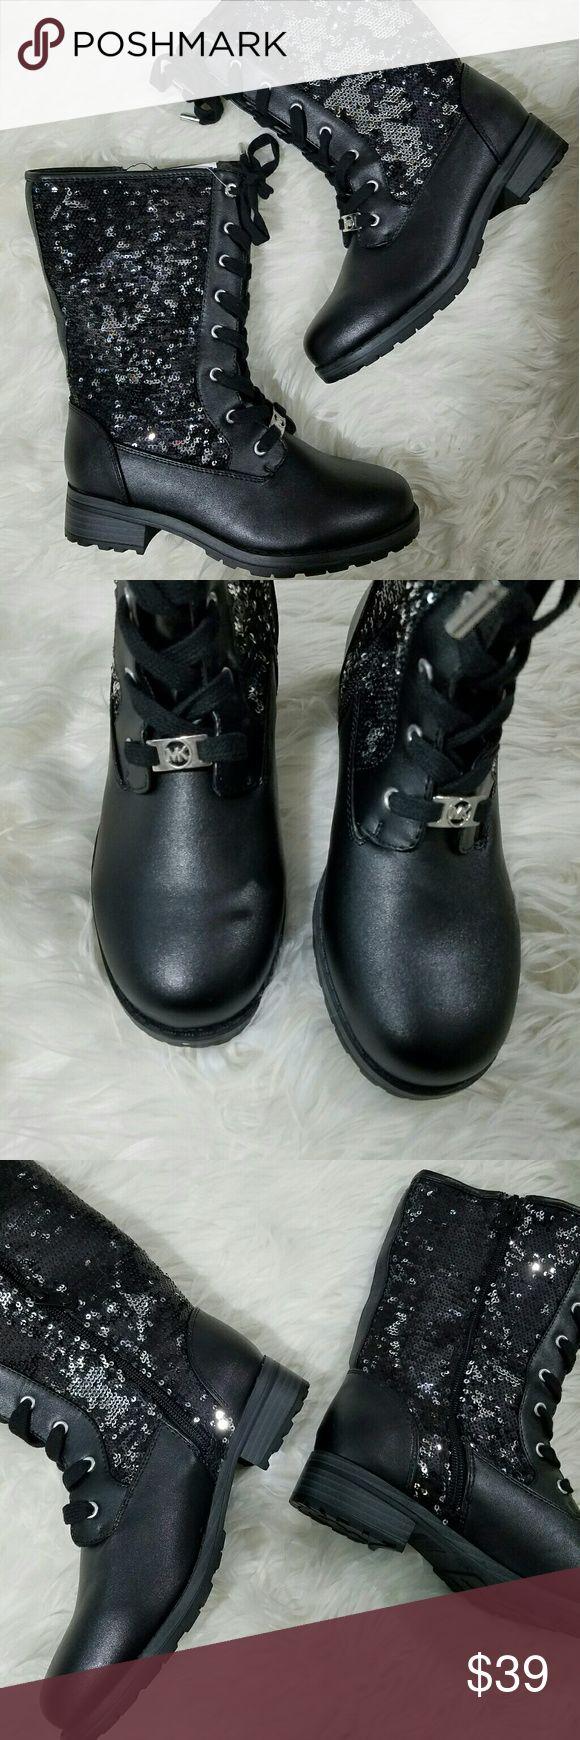 Michael Kors Sequin Glitter Combat Boots Girl's MK boots.  Cute boots!!   SS Michael Kors Shoes Boots